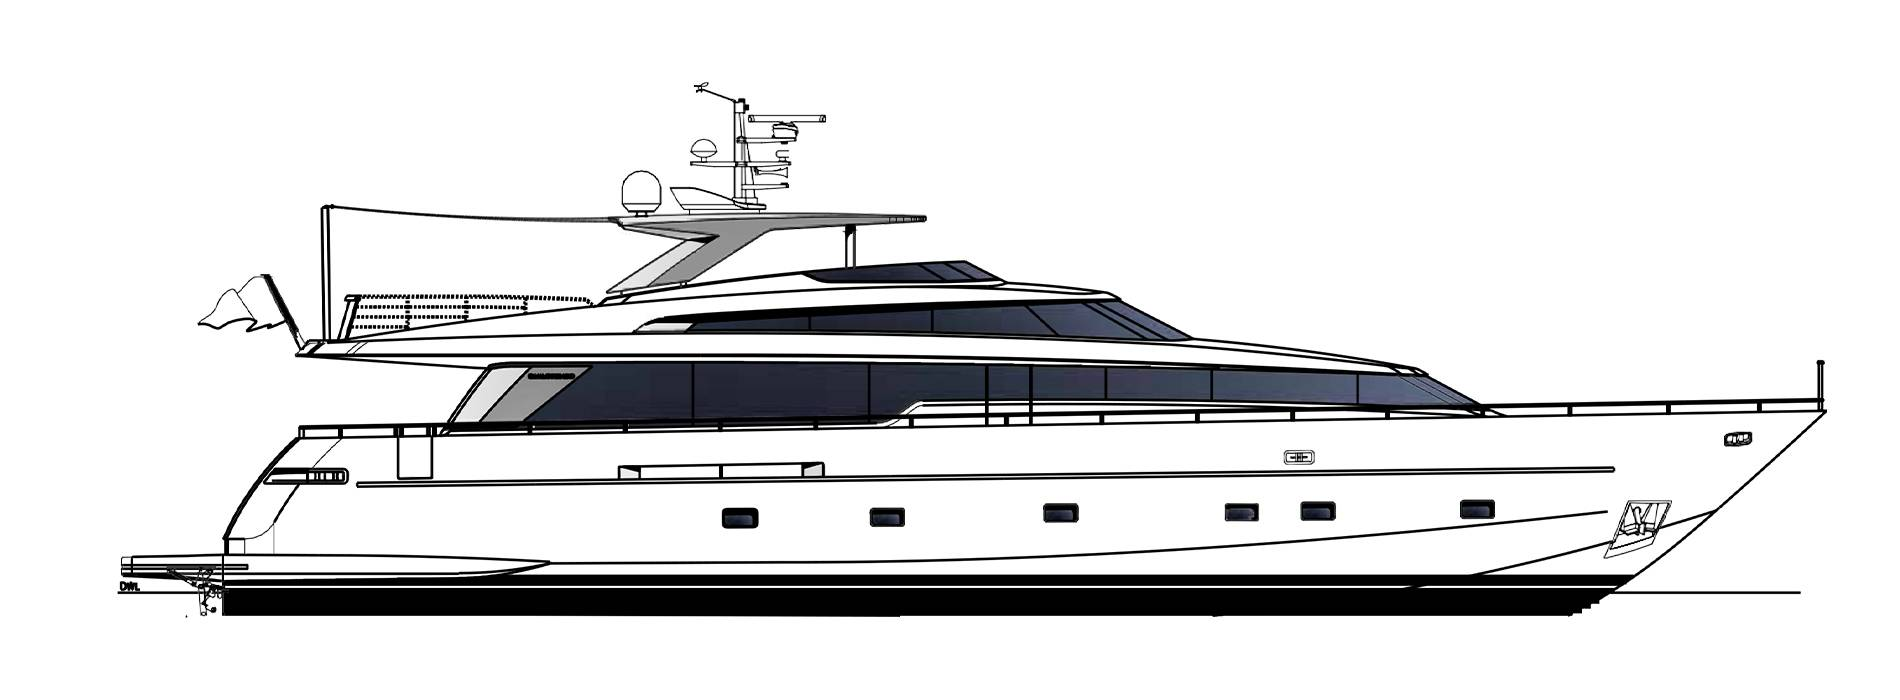 Sanlorenzo Yachts SL96-623 Perfil